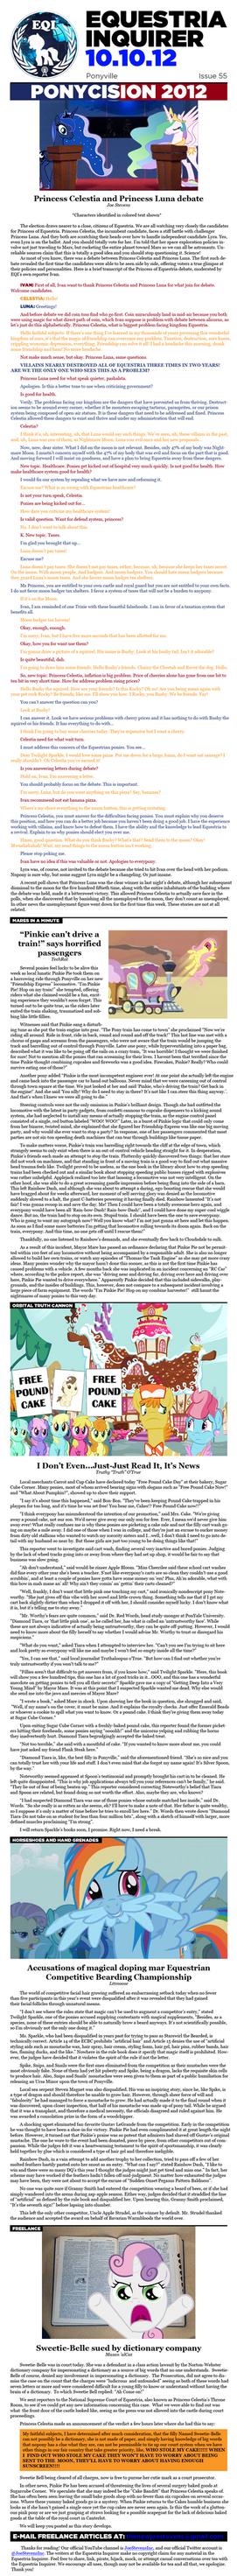 Equestria Inquirer 54 by JoeStevensInc